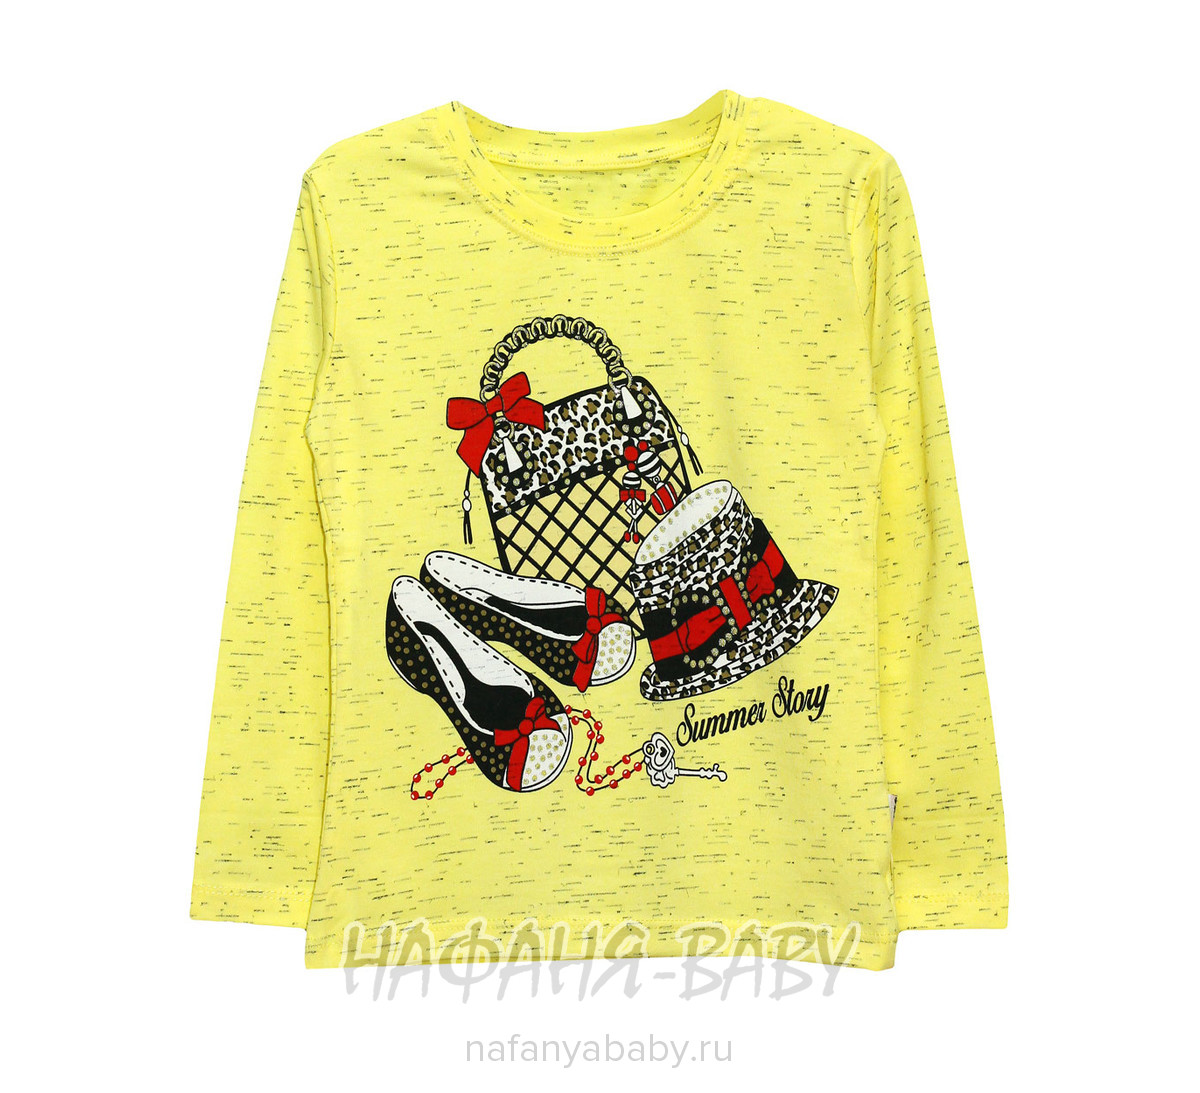 Детский лонгслив UNRULY арт: 5138, 5-9 лет, 1-4 года, цвет желтый меланж, оптом Турция